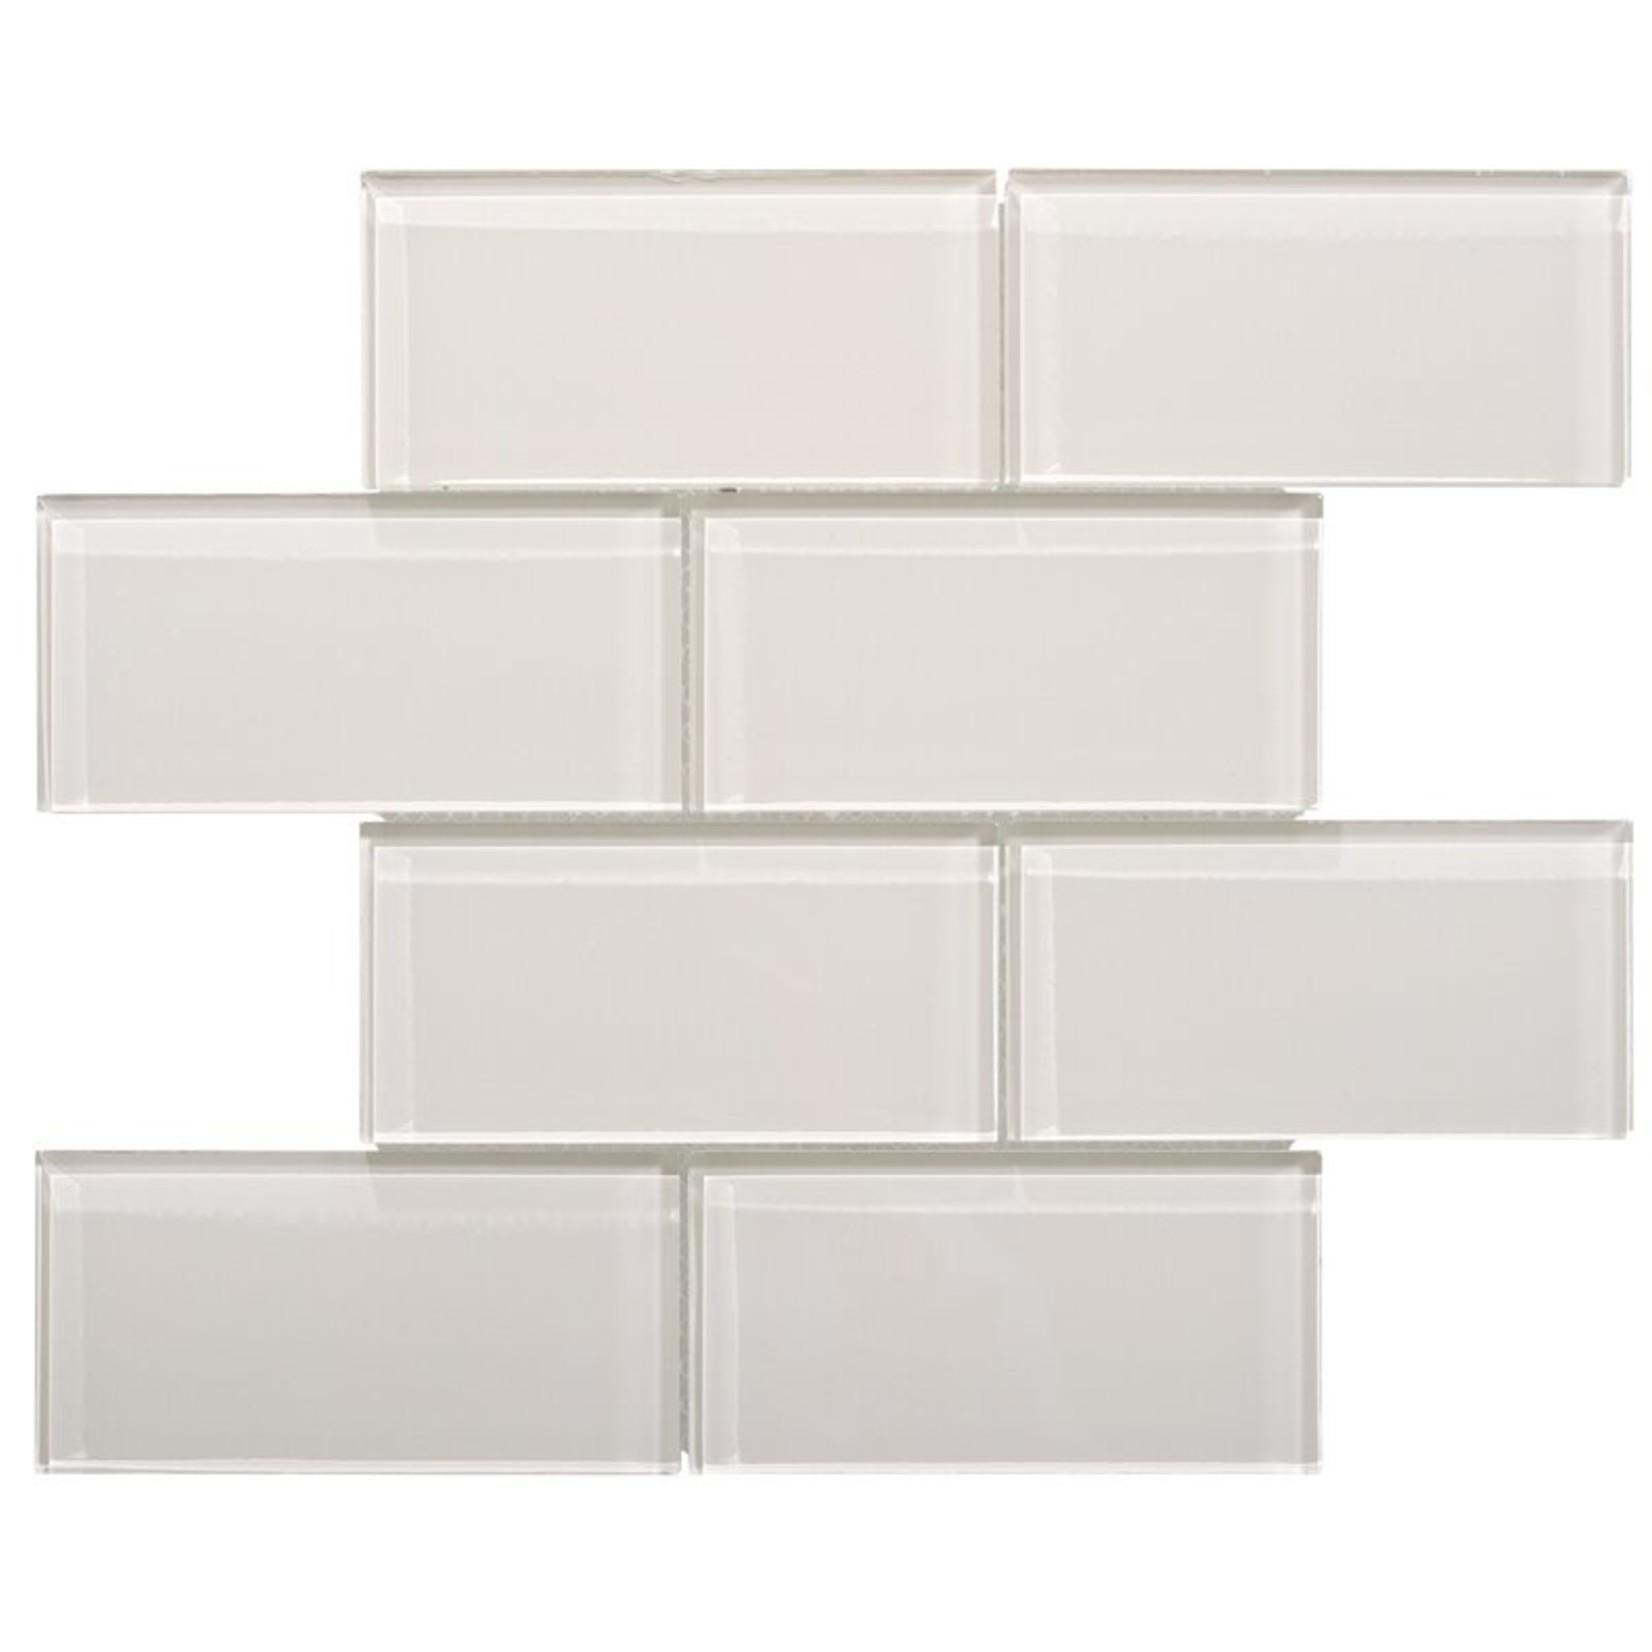 "*Premium 3"" x 6"" Glass Mosaic Subway Tile - Taupe"